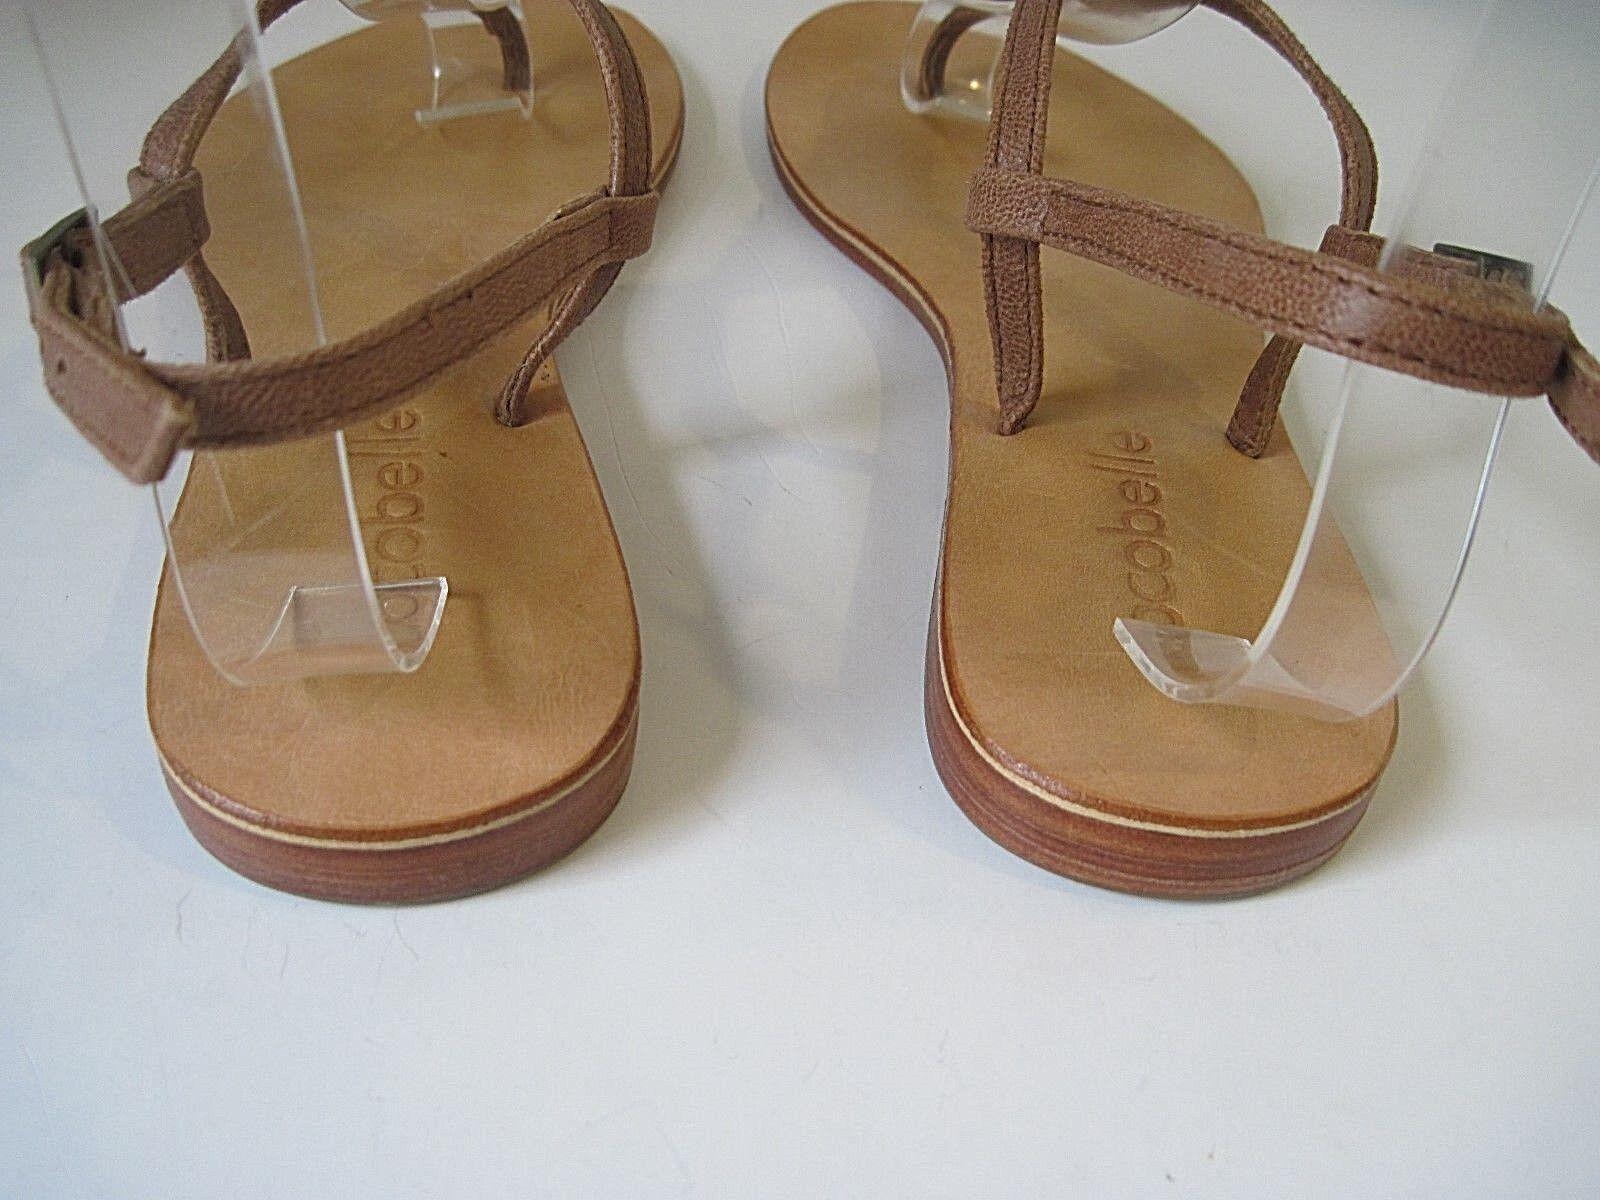 Cocobelle Pelle Pelle Cocobelle Embellished Strappy Thong Sandals Size 6.5 / 37 Handmade f877ec